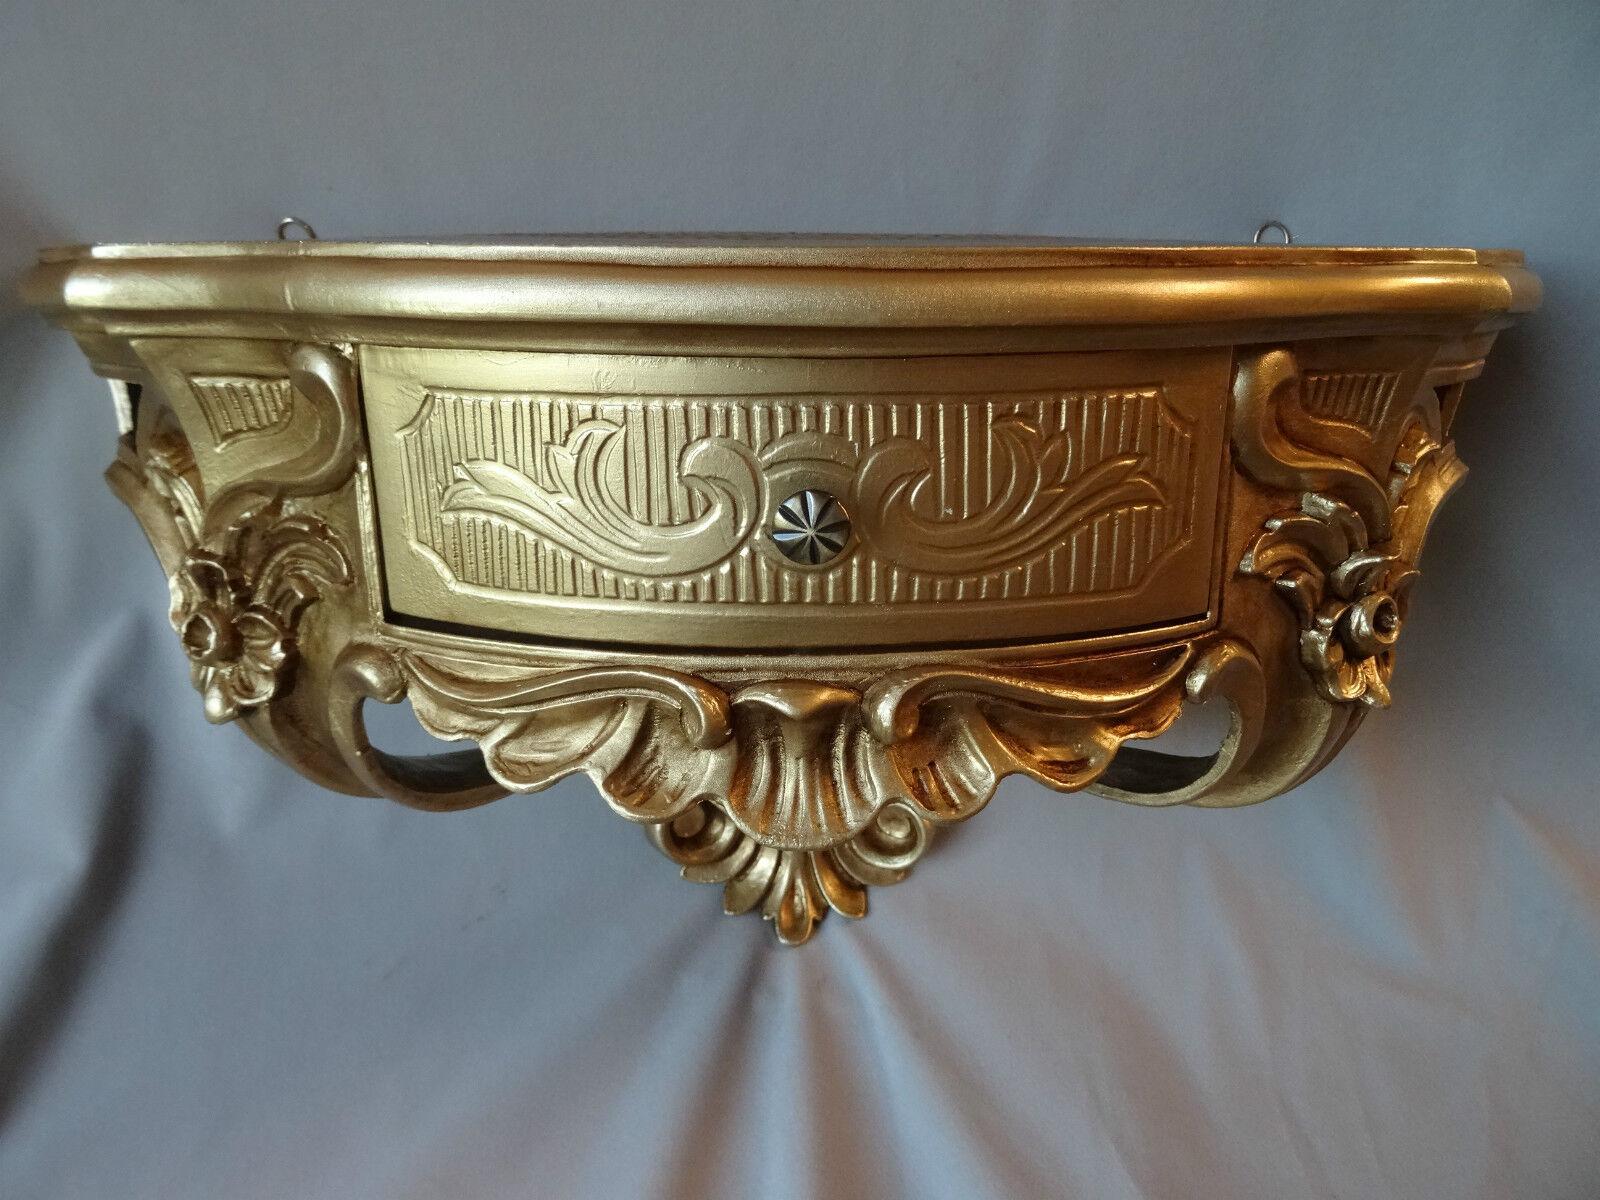 wandkonsole schublade spiegelkonsolen wandregal barock antik gold 50x27 cp84 ebay. Black Bedroom Furniture Sets. Home Design Ideas